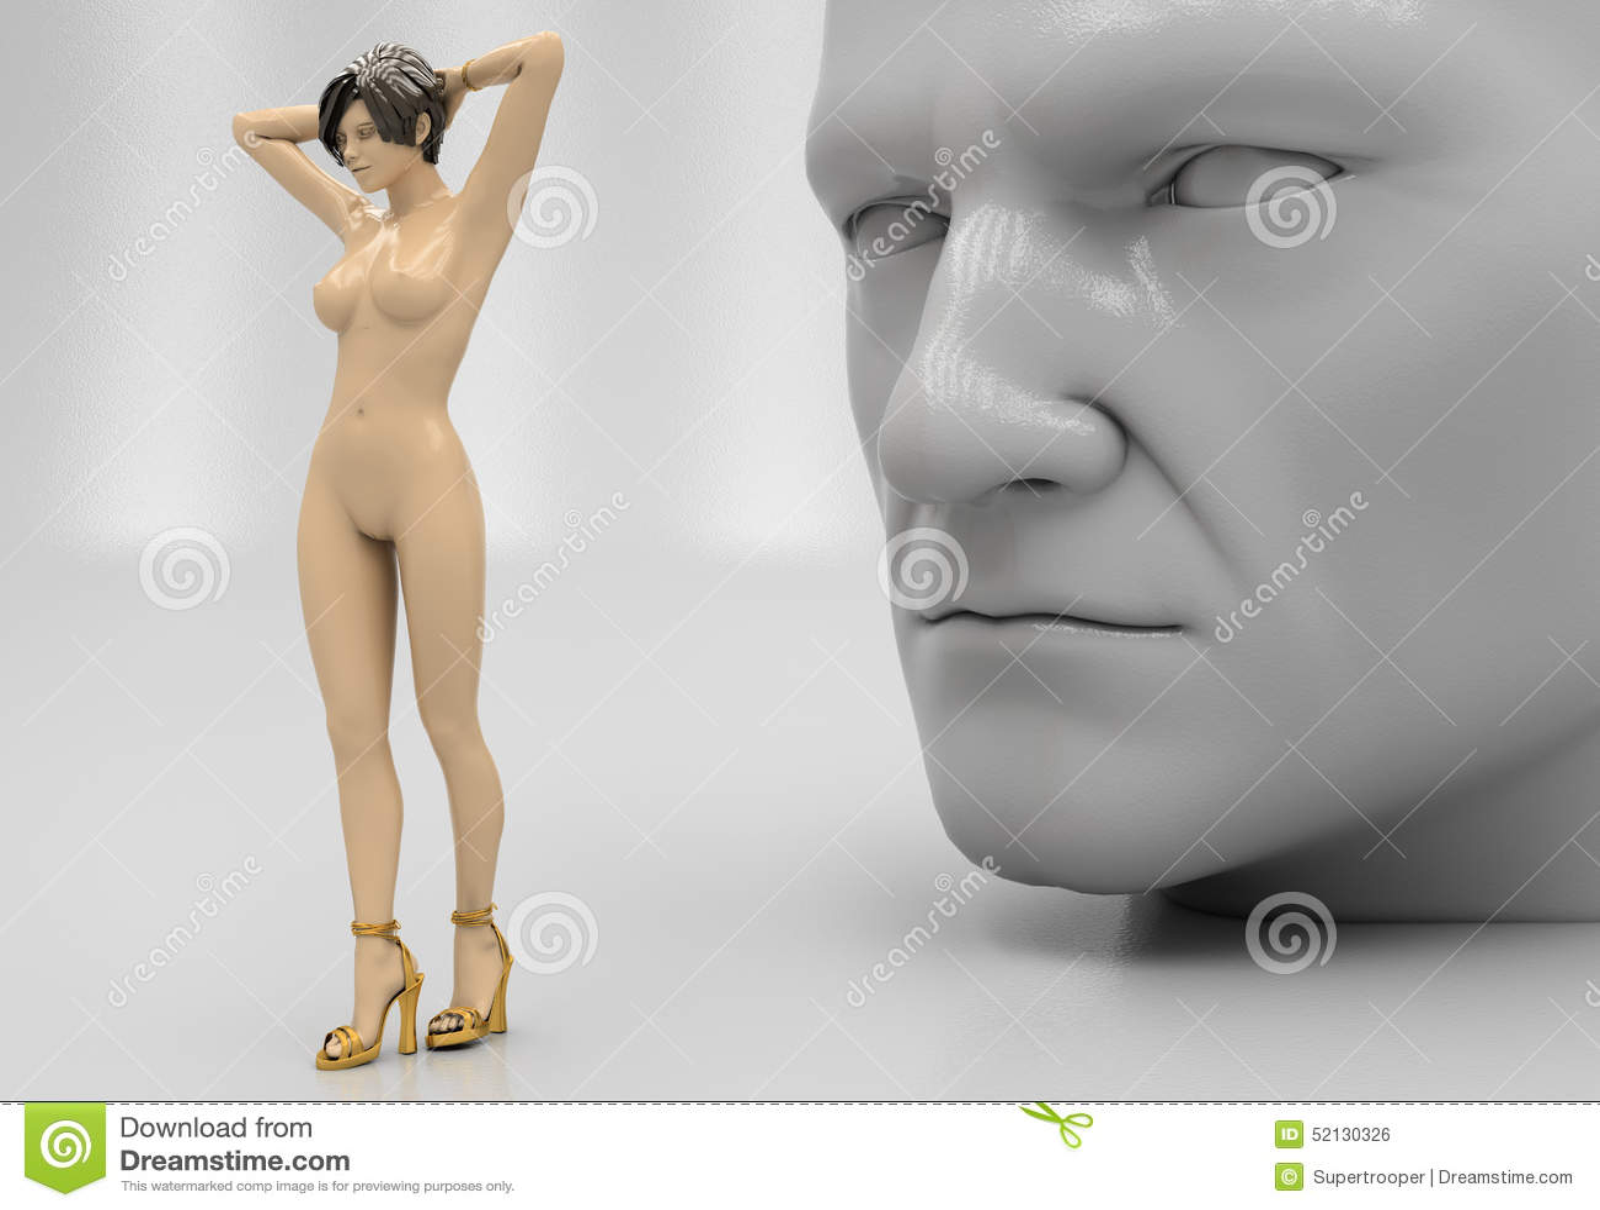 Lorraine bracco naked photos